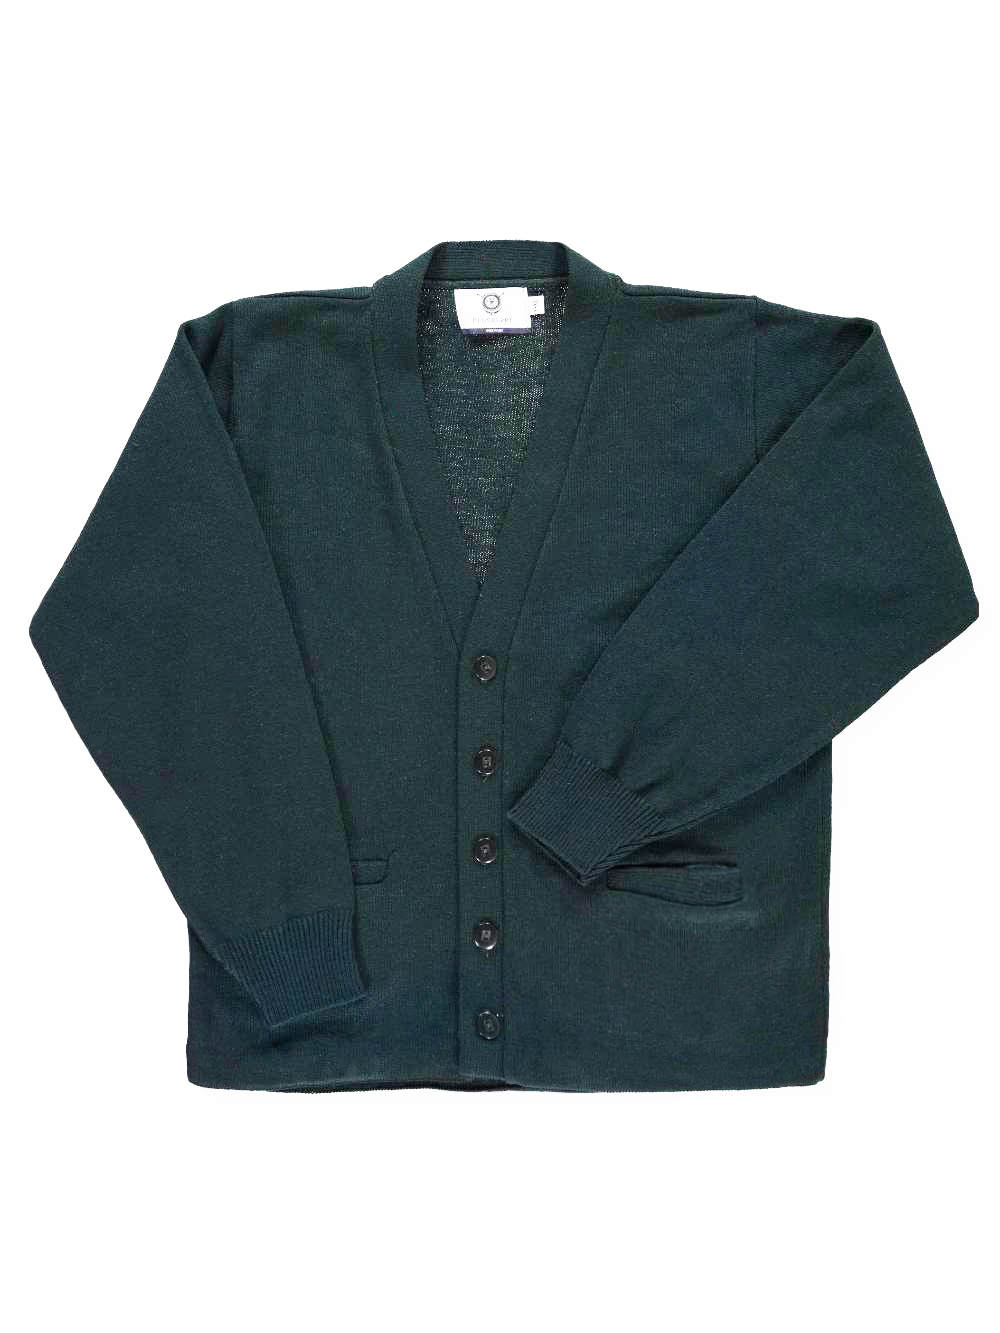 Big Boys' L/S Unisex Cardigan Sweater (Sizes 8 - 20)